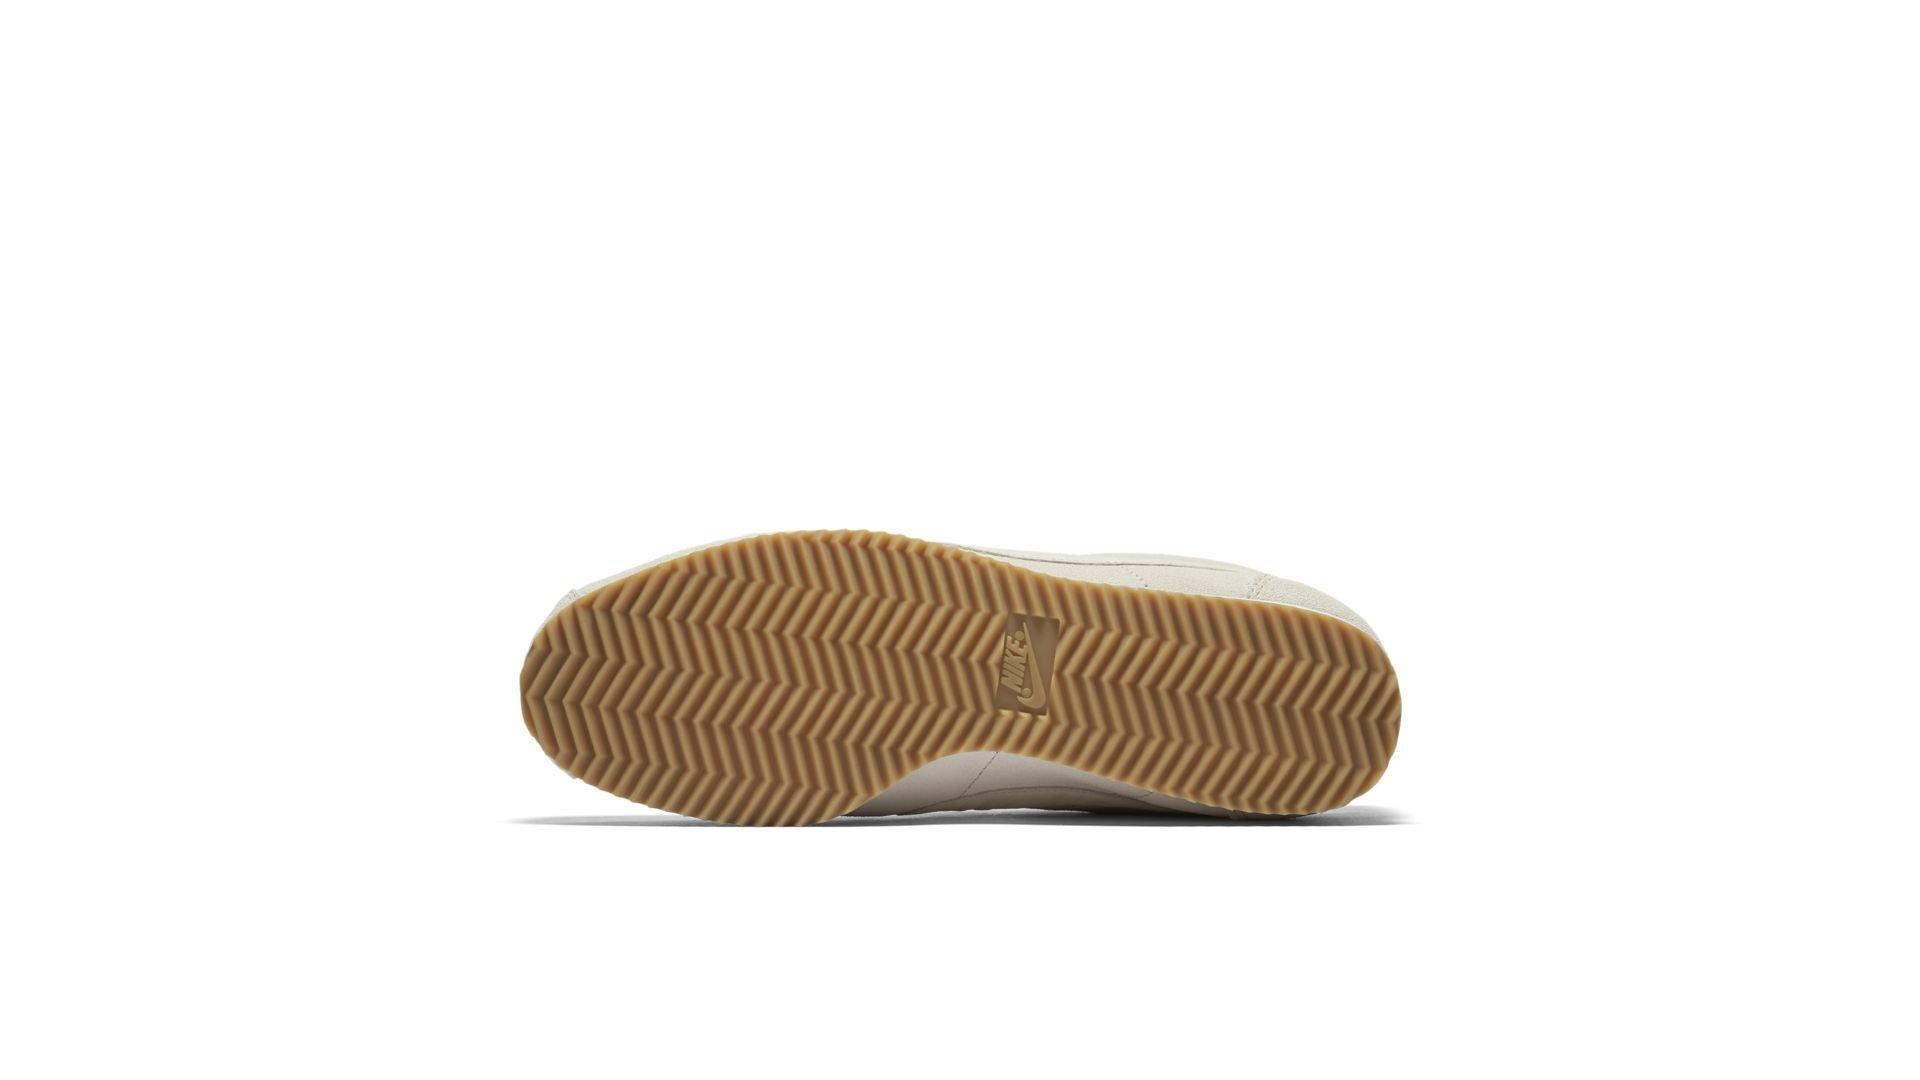 Nike Classic Cortez ALC Light Orewood Brown (W) (AH5206-100)